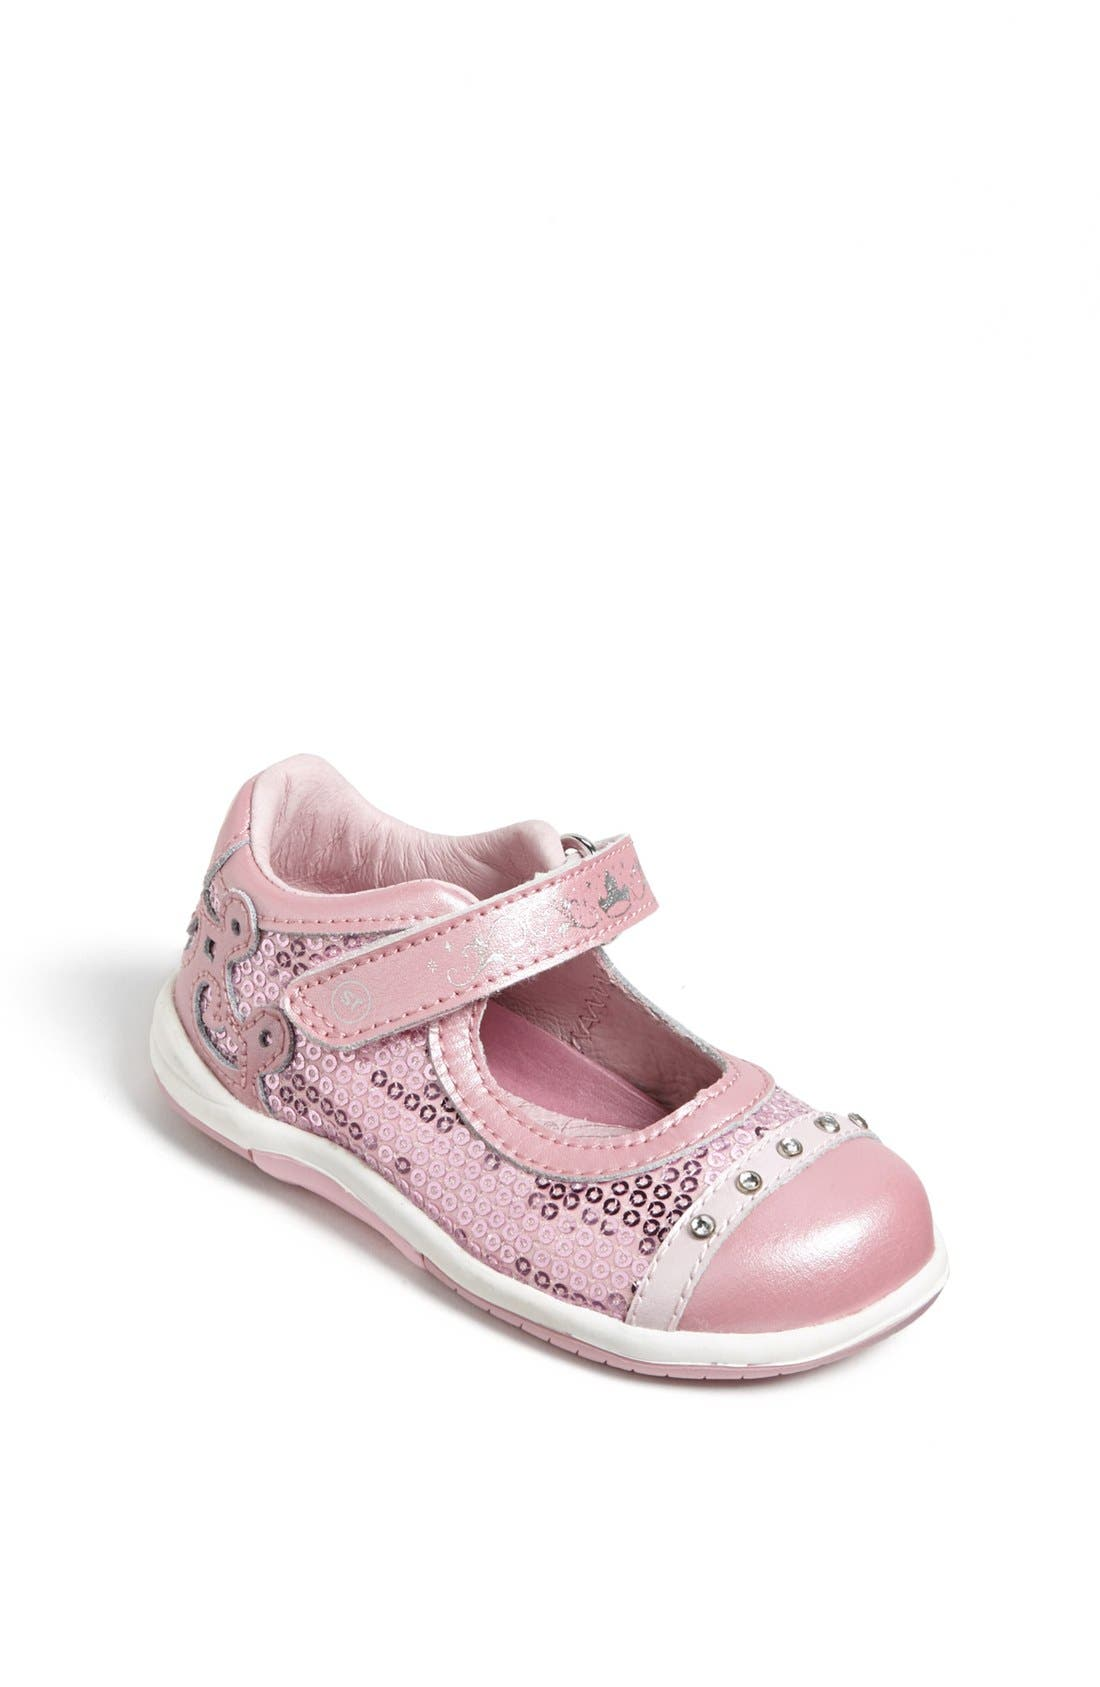 Main Image - Stride Rite 'SRT Aurora' Mary Jane Sneaker (Baby, Walker & Toddler)